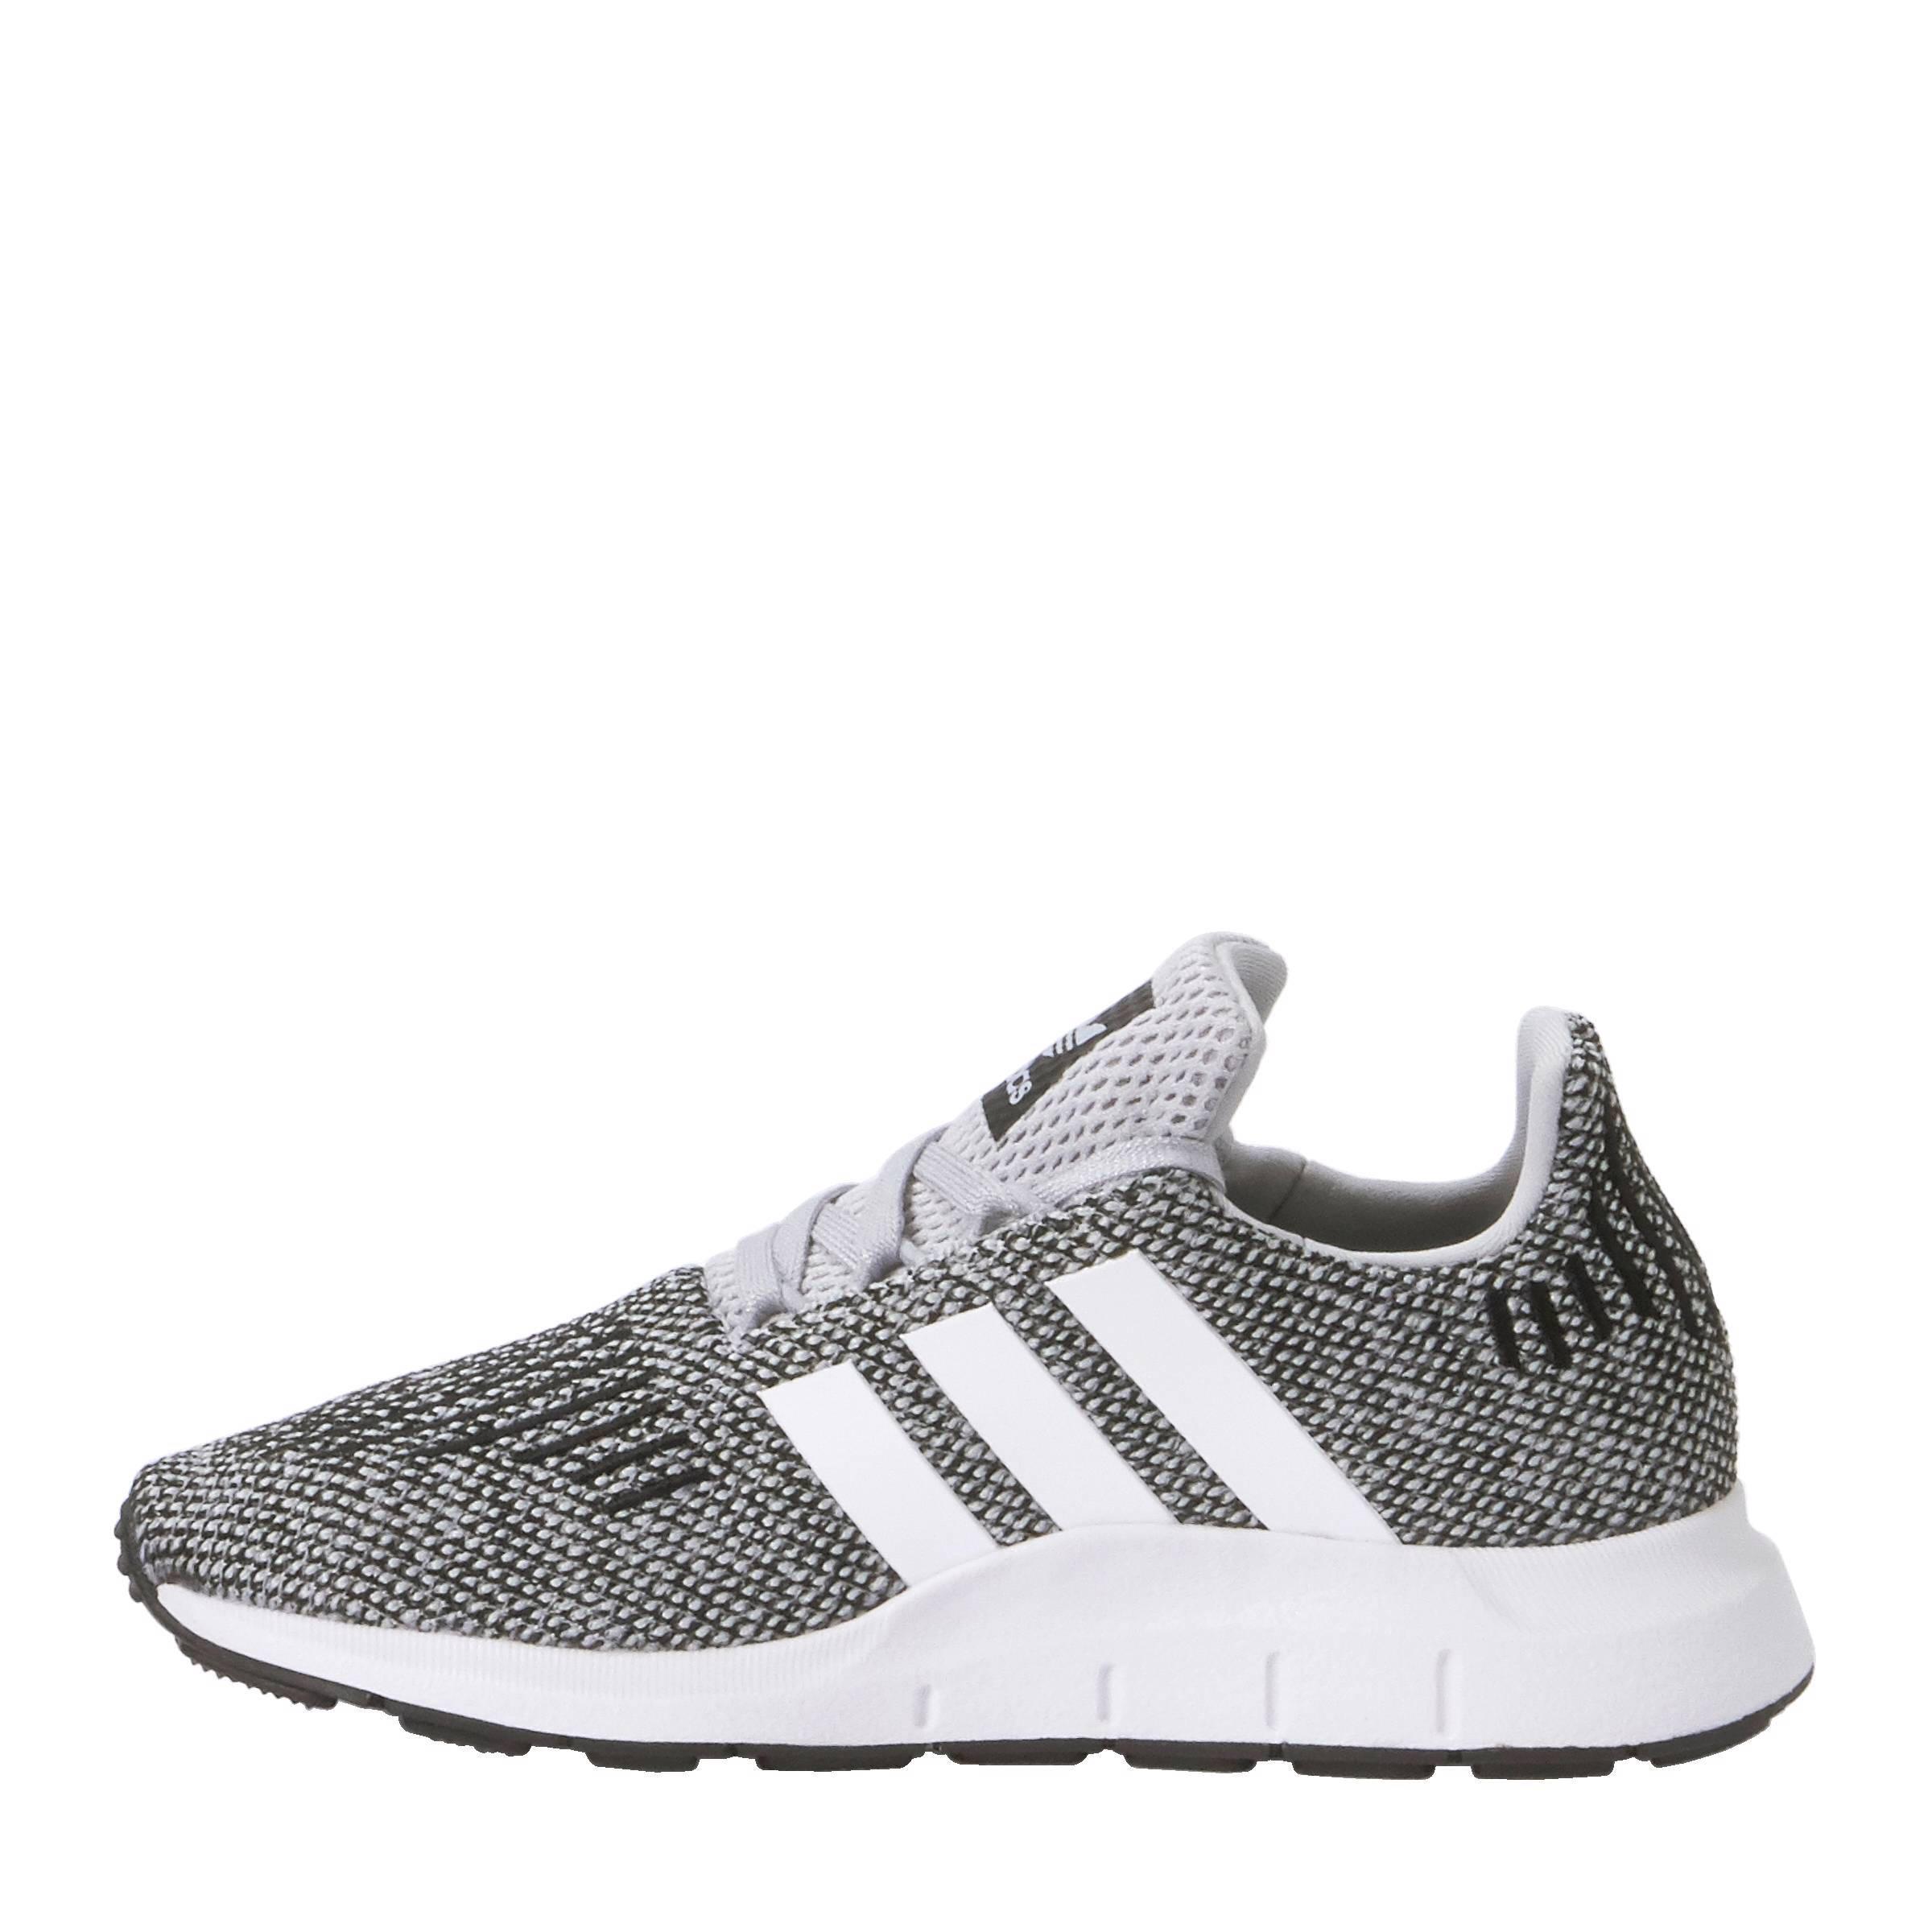 5f8e71bacd279 adidas originals Swift Run C sneakers